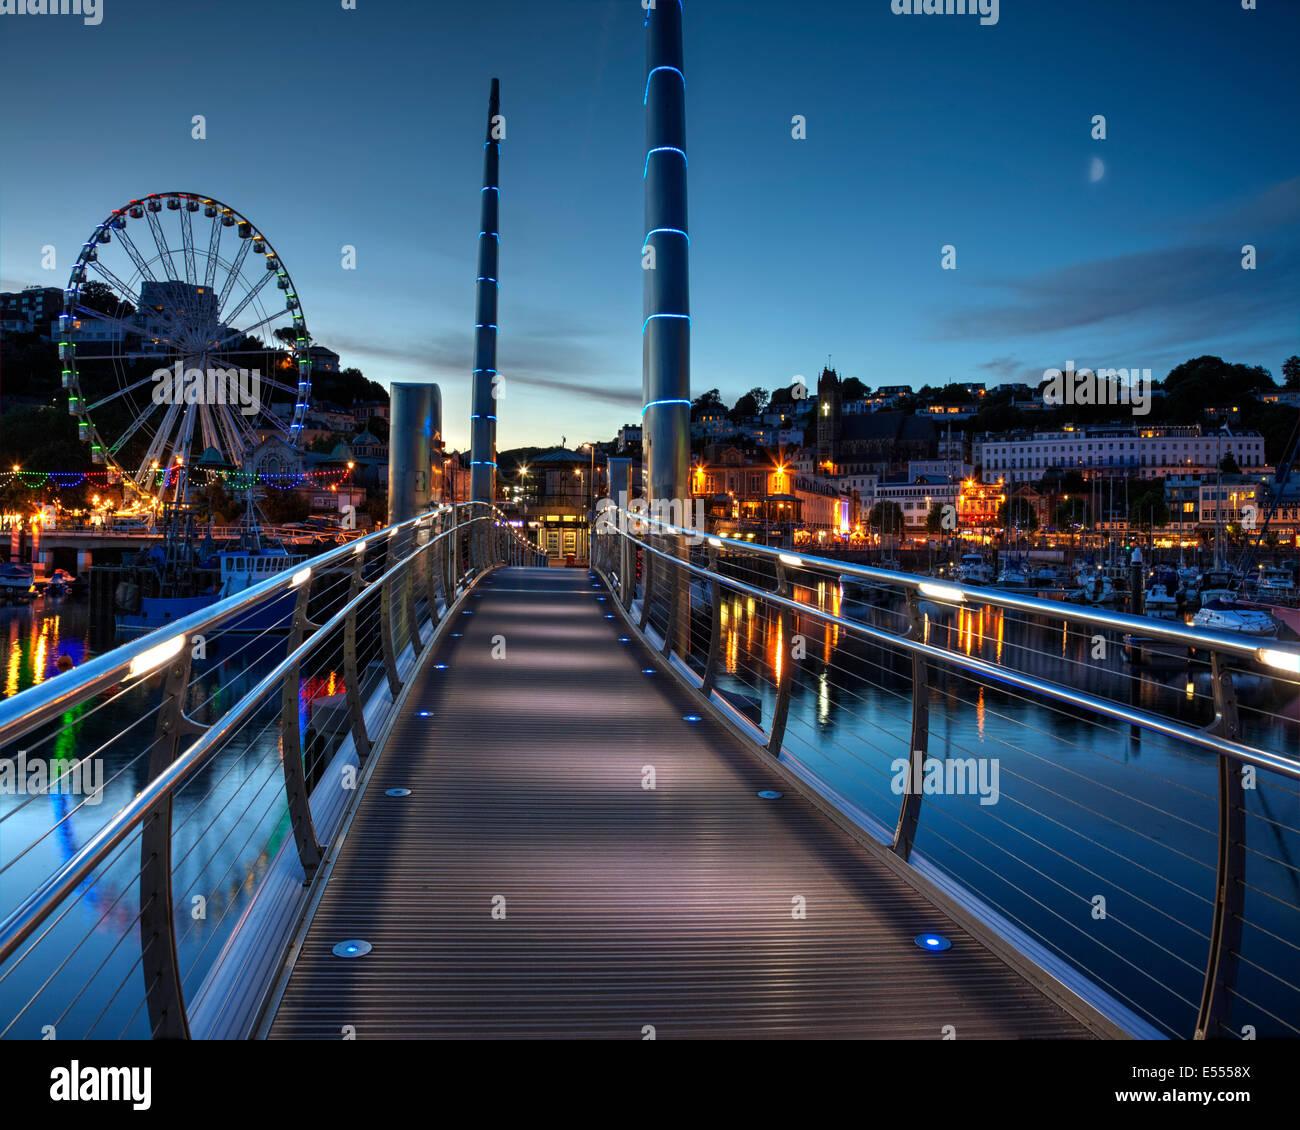 bridge gb night london - photo #28